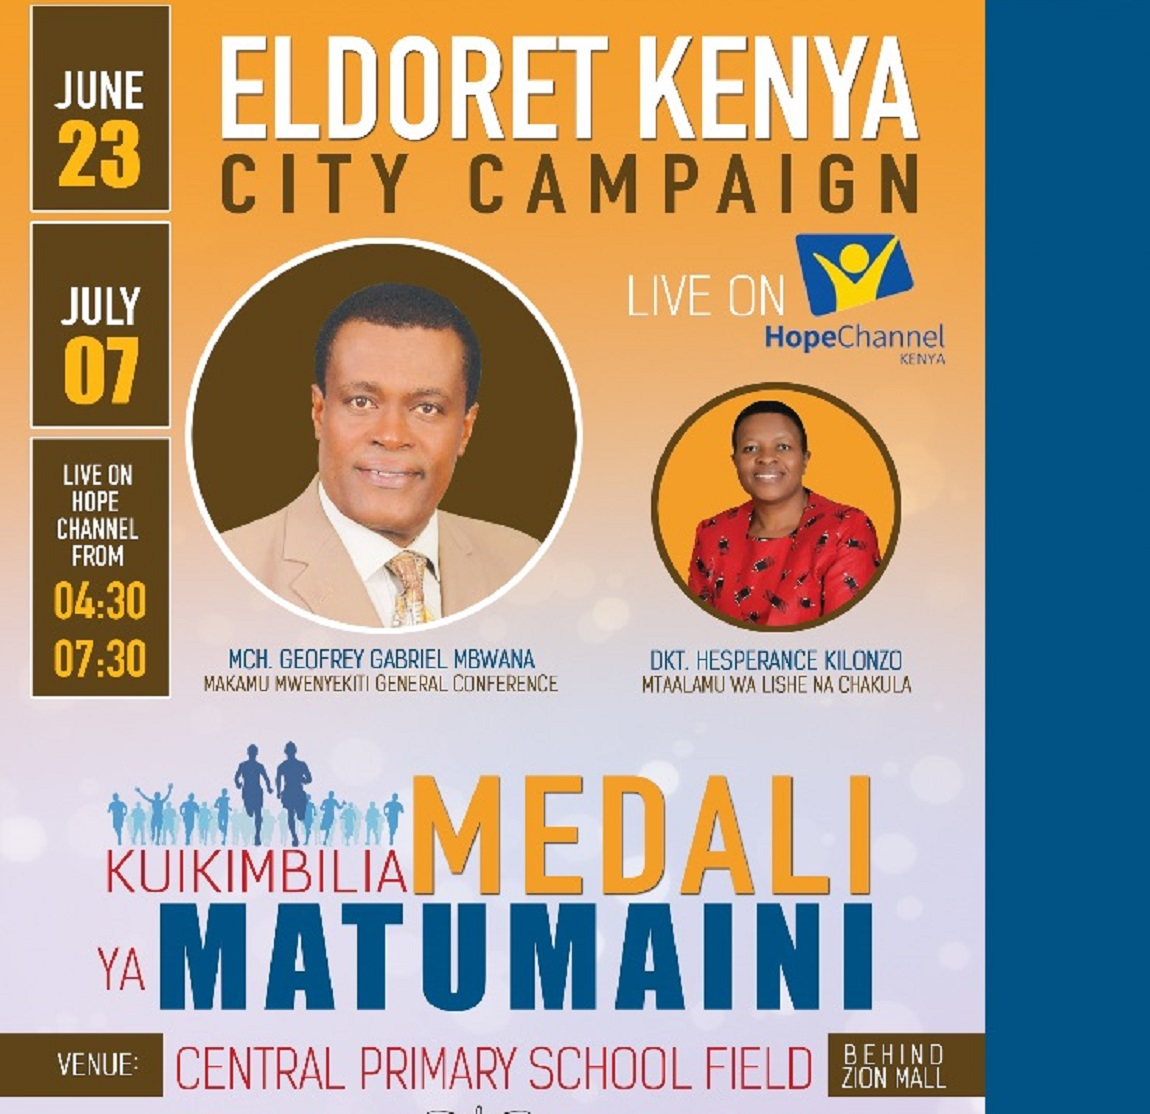 Eldoret City Evangelistic Campaign